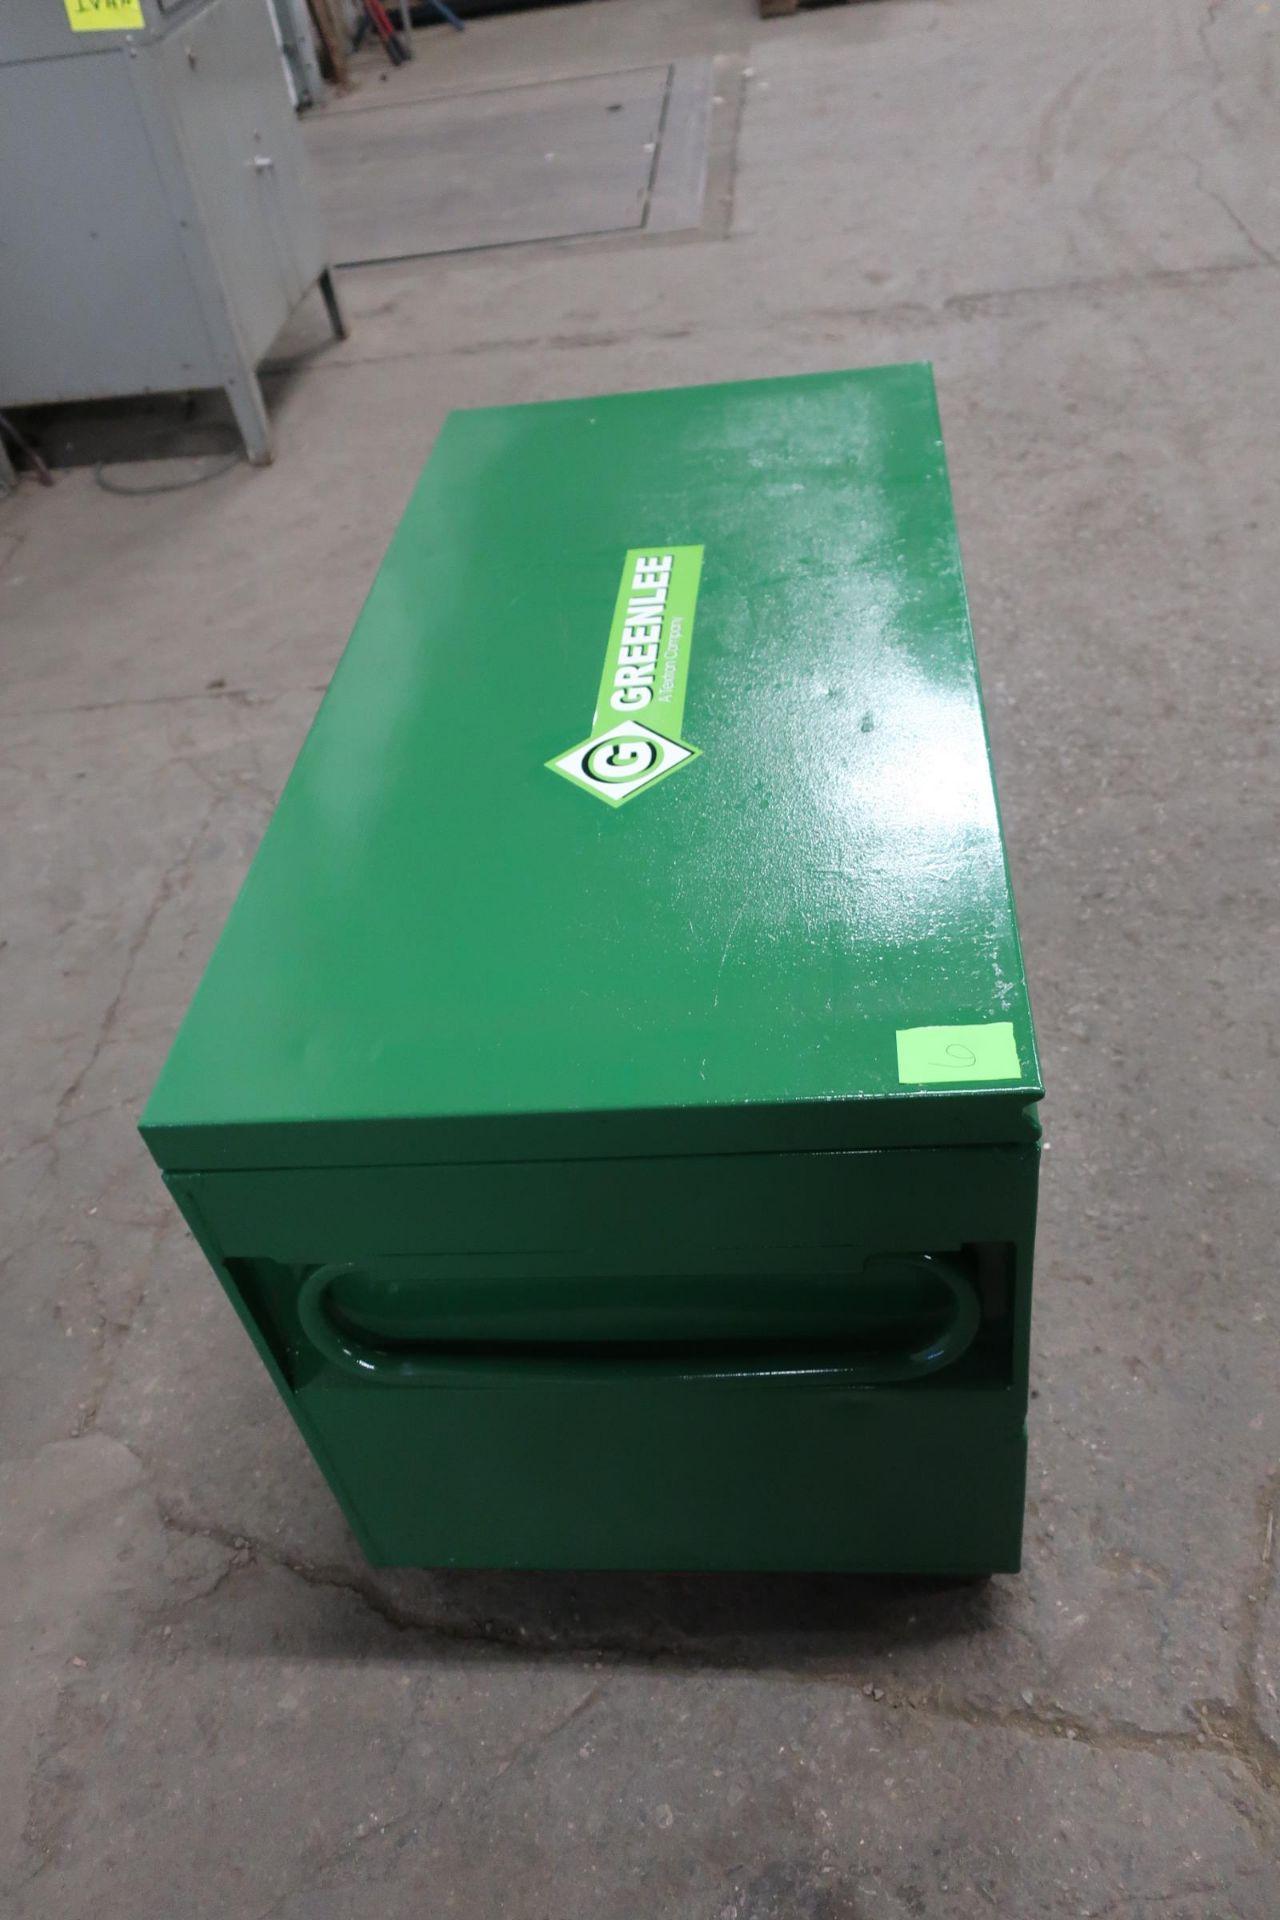 Greenlee Tool Box Jobox 4' x 2' x 2' - Image 2 of 2